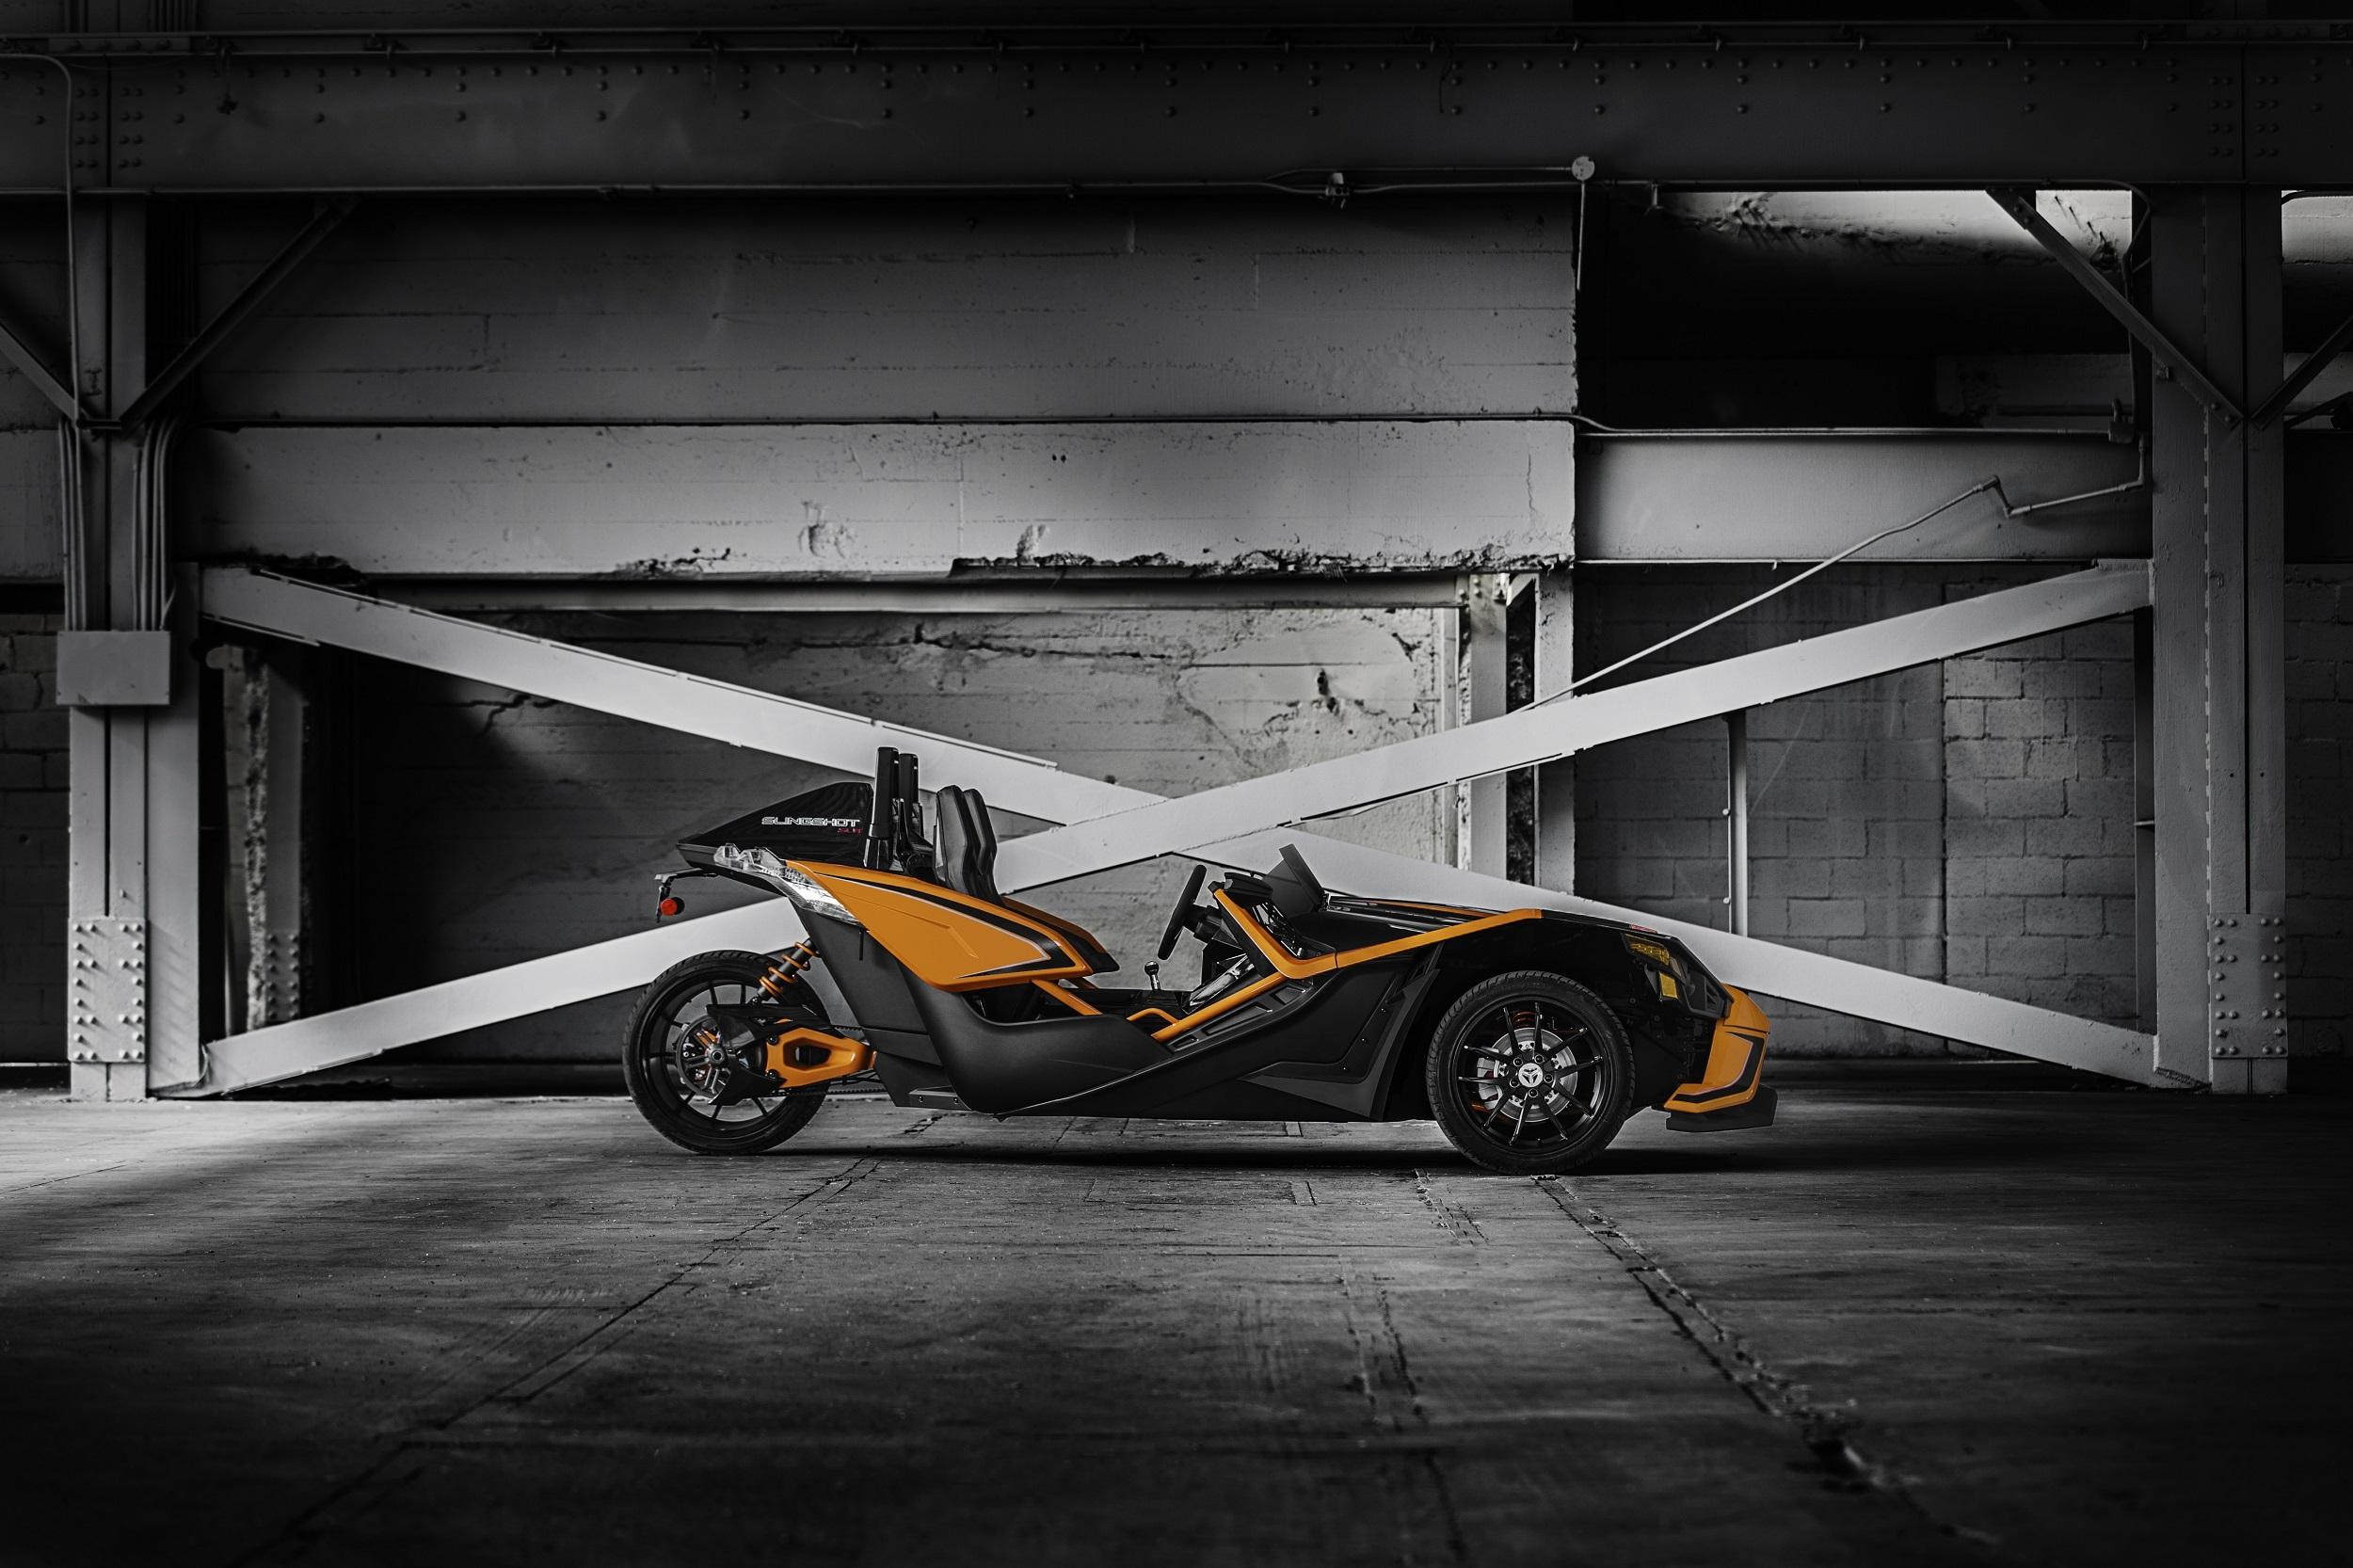 Polaris 2017 Slingshot SLR orange